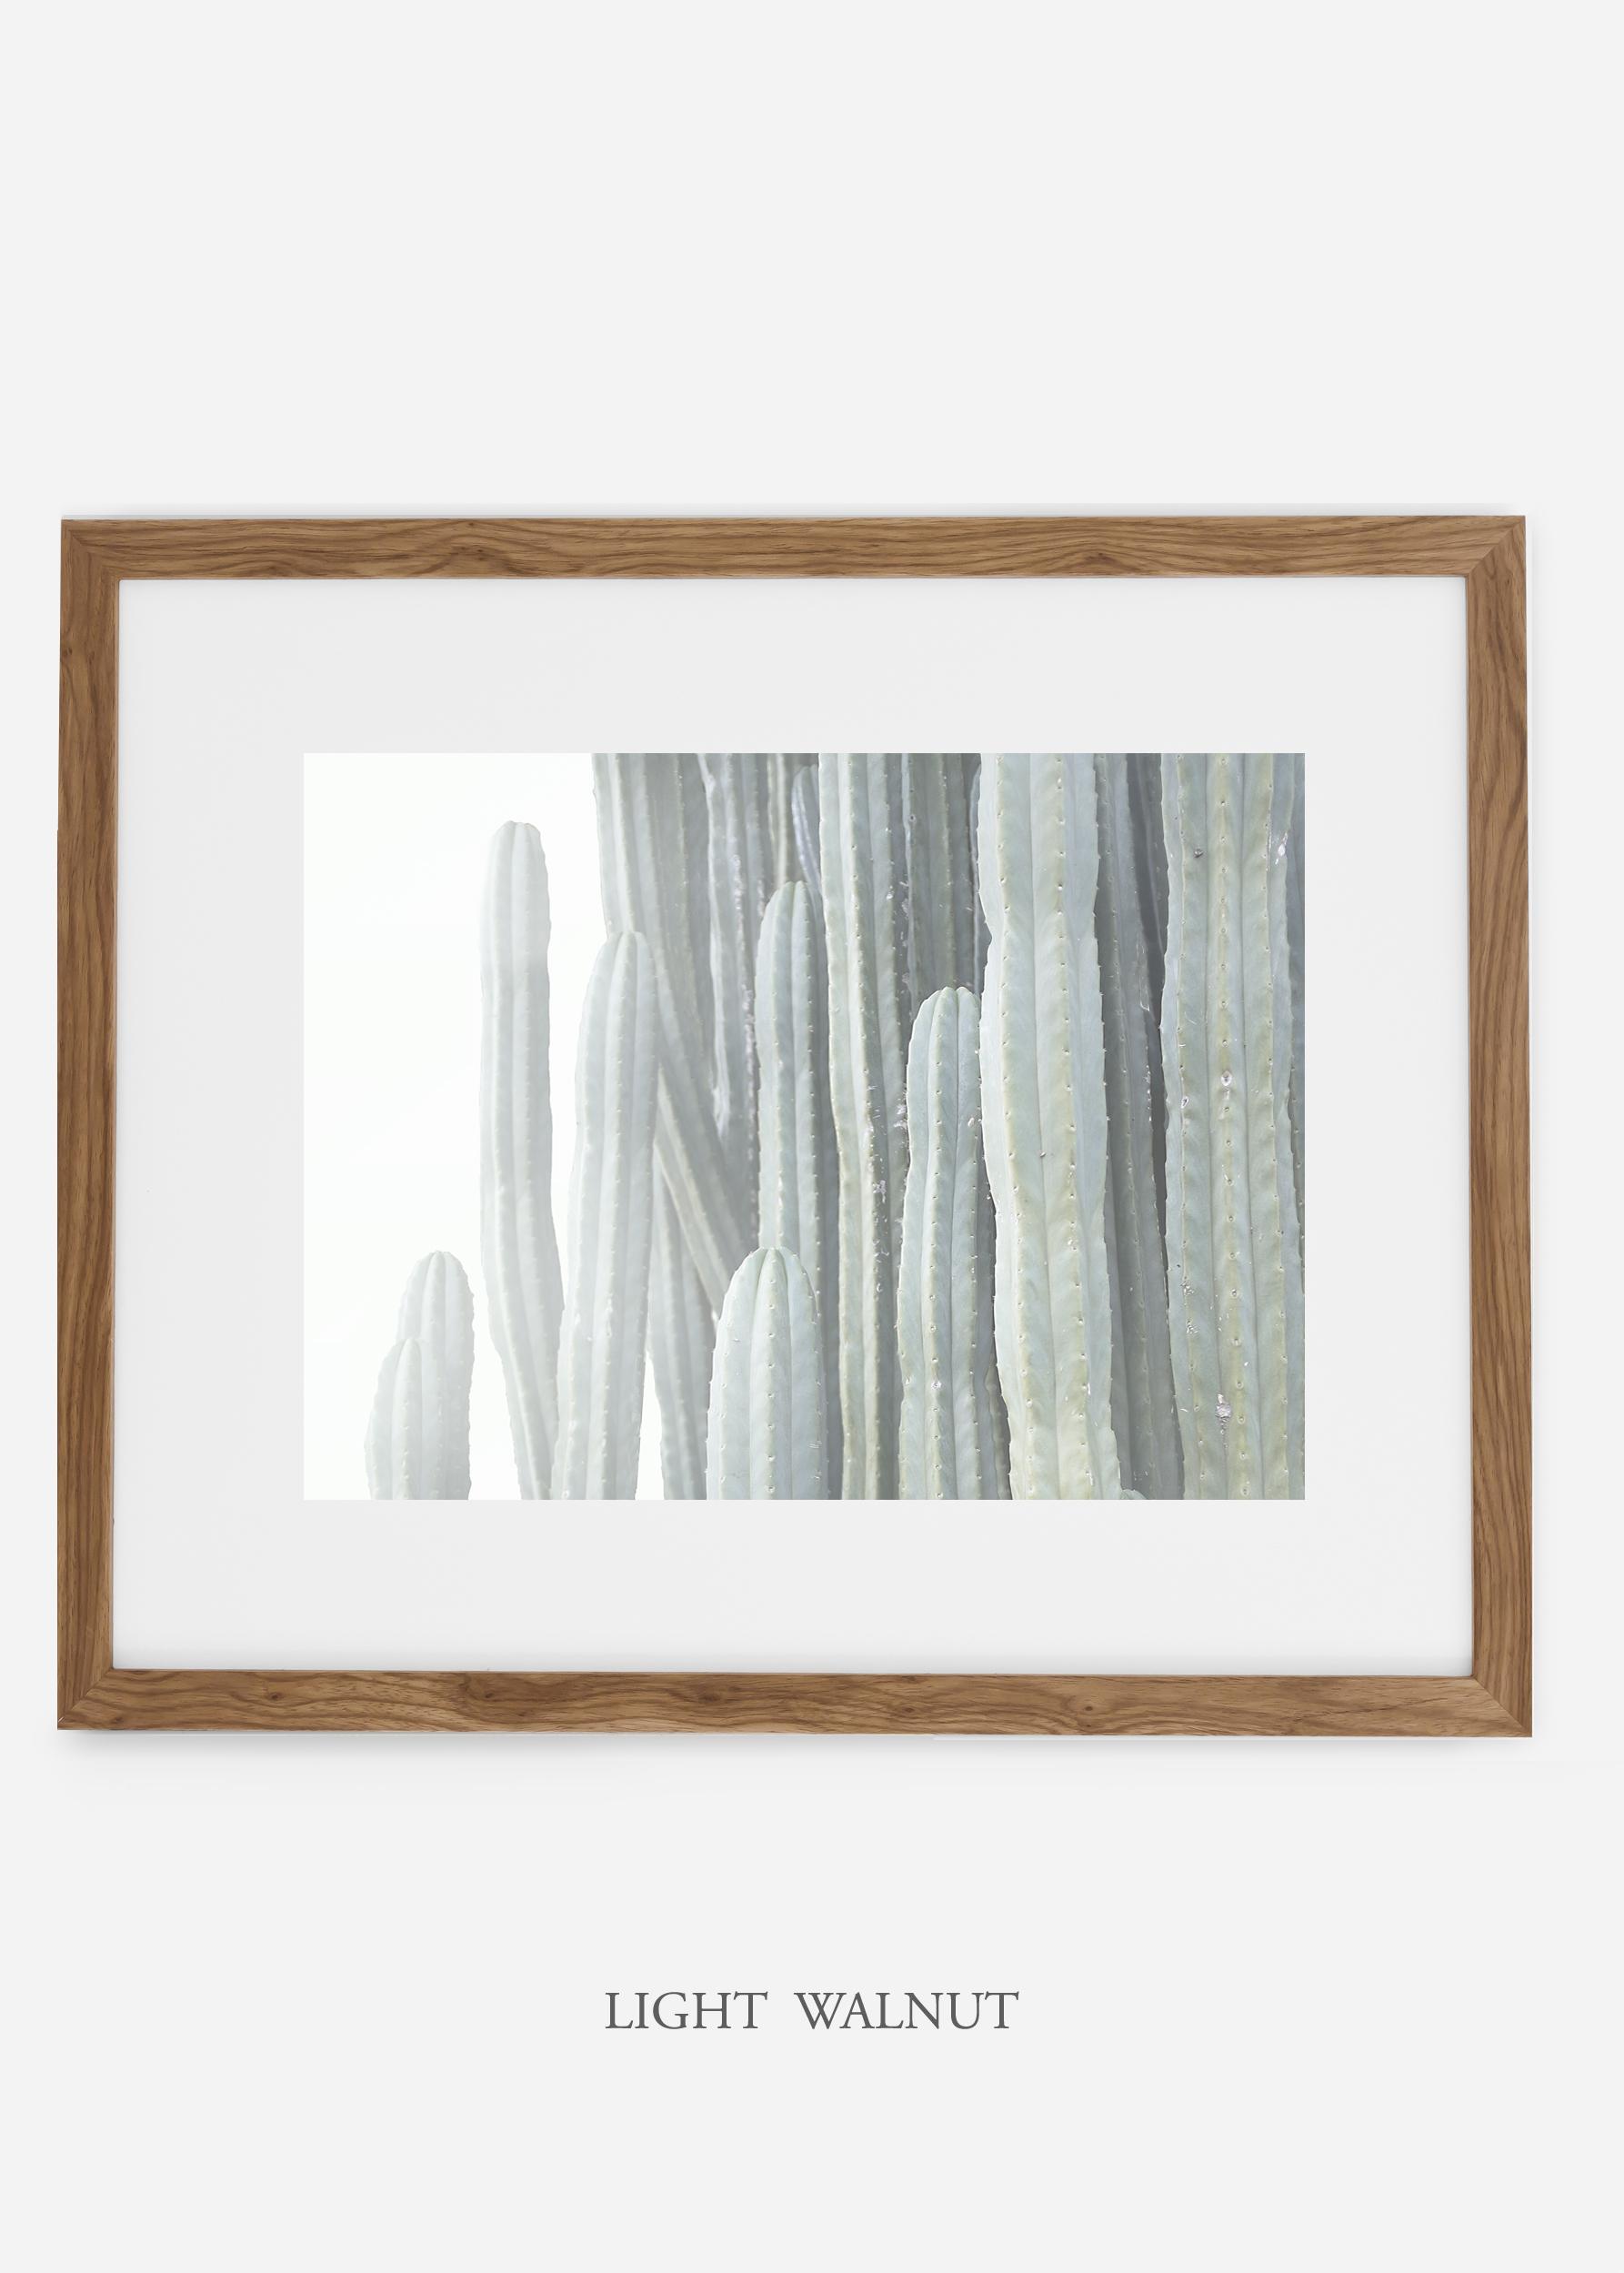 WilderCalifornia_lightwalnutframe__Cactus_Art_Photography_interiordesign_white_bohemian_neutral_photography_photo.jpg